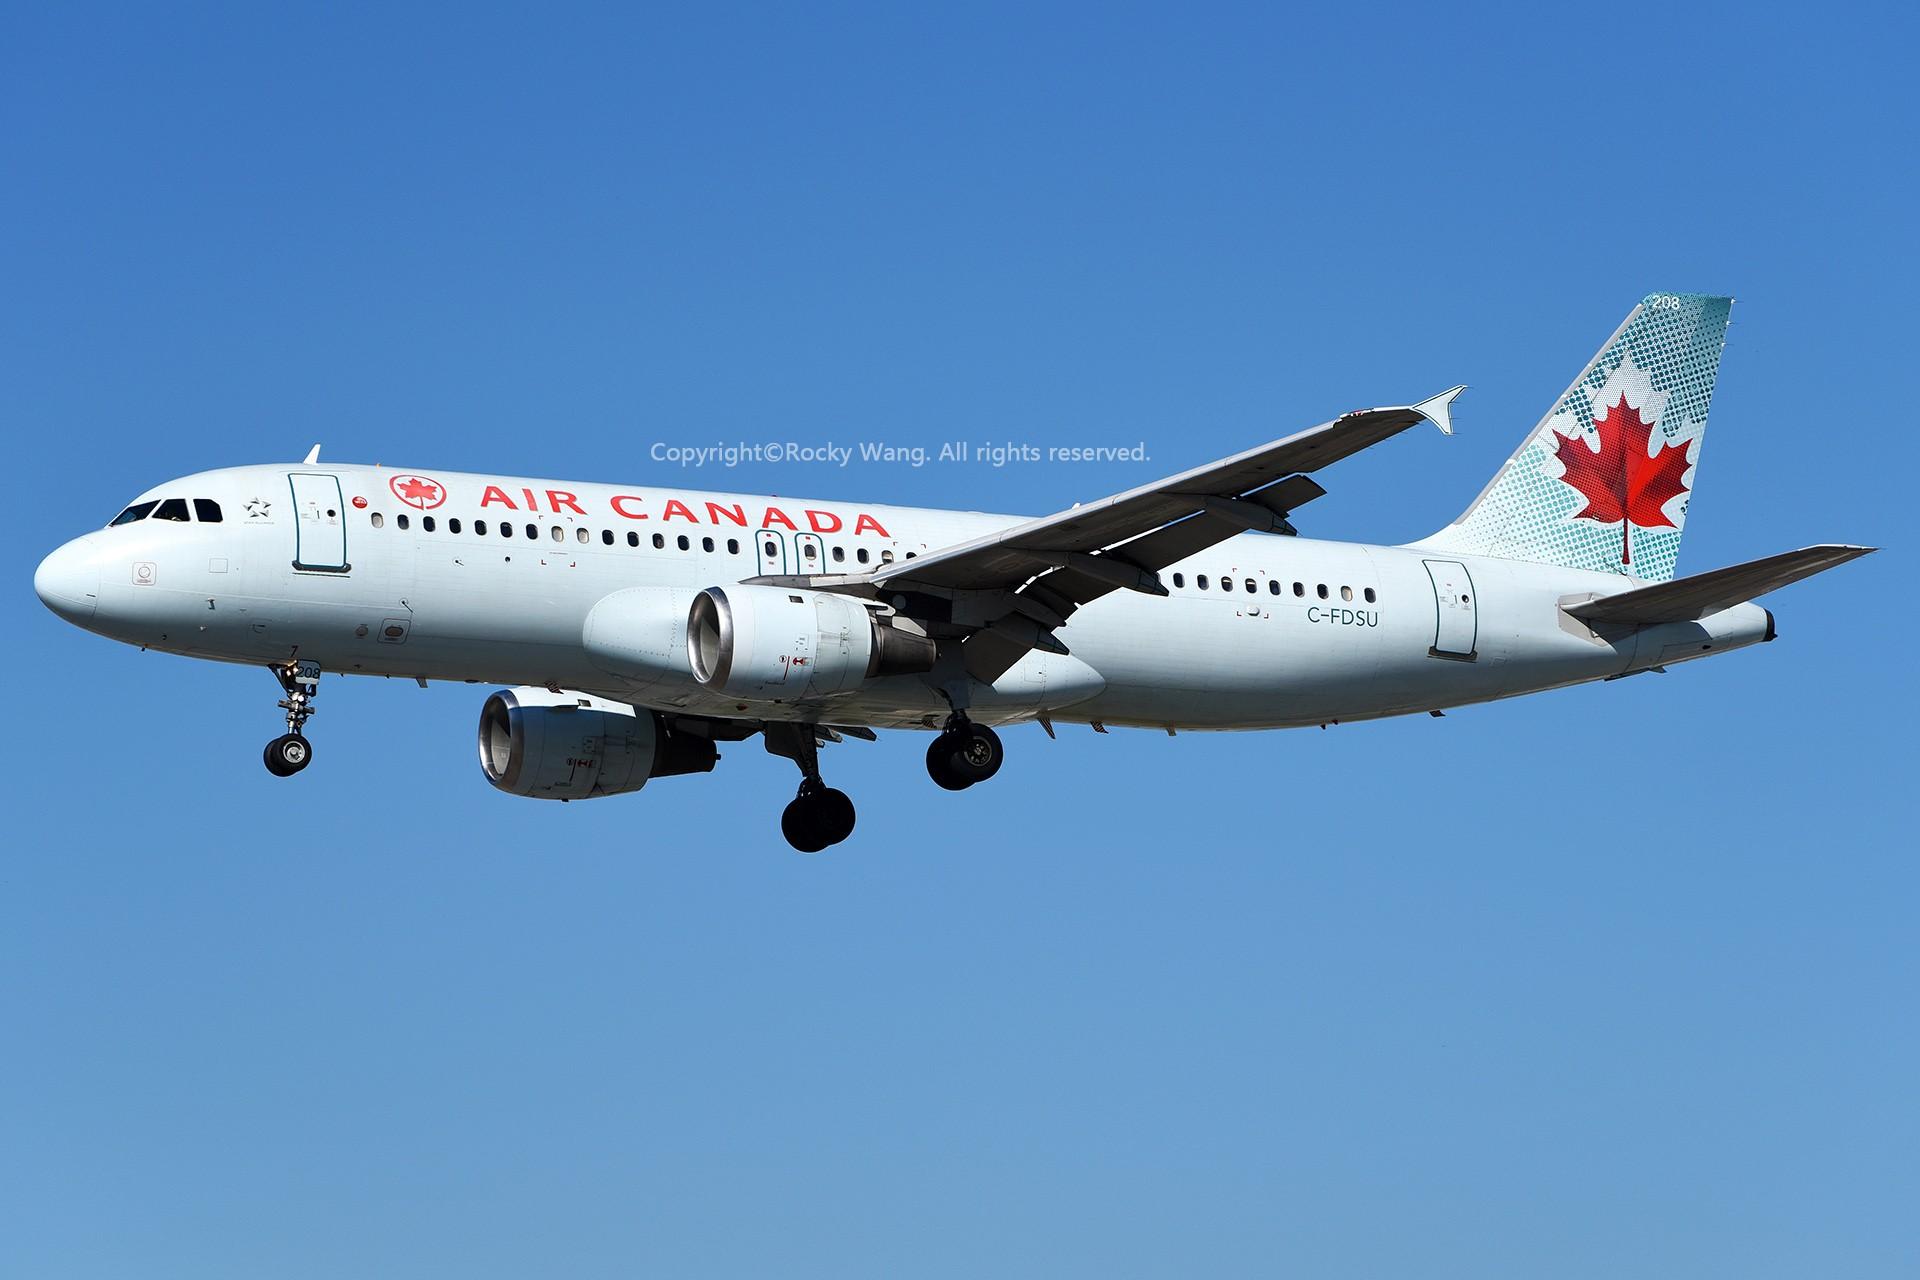 Re:[原创]窄体连连看 AIRBUS A320-211 C-FDSU 加拿大多伦多皮尔逊机场